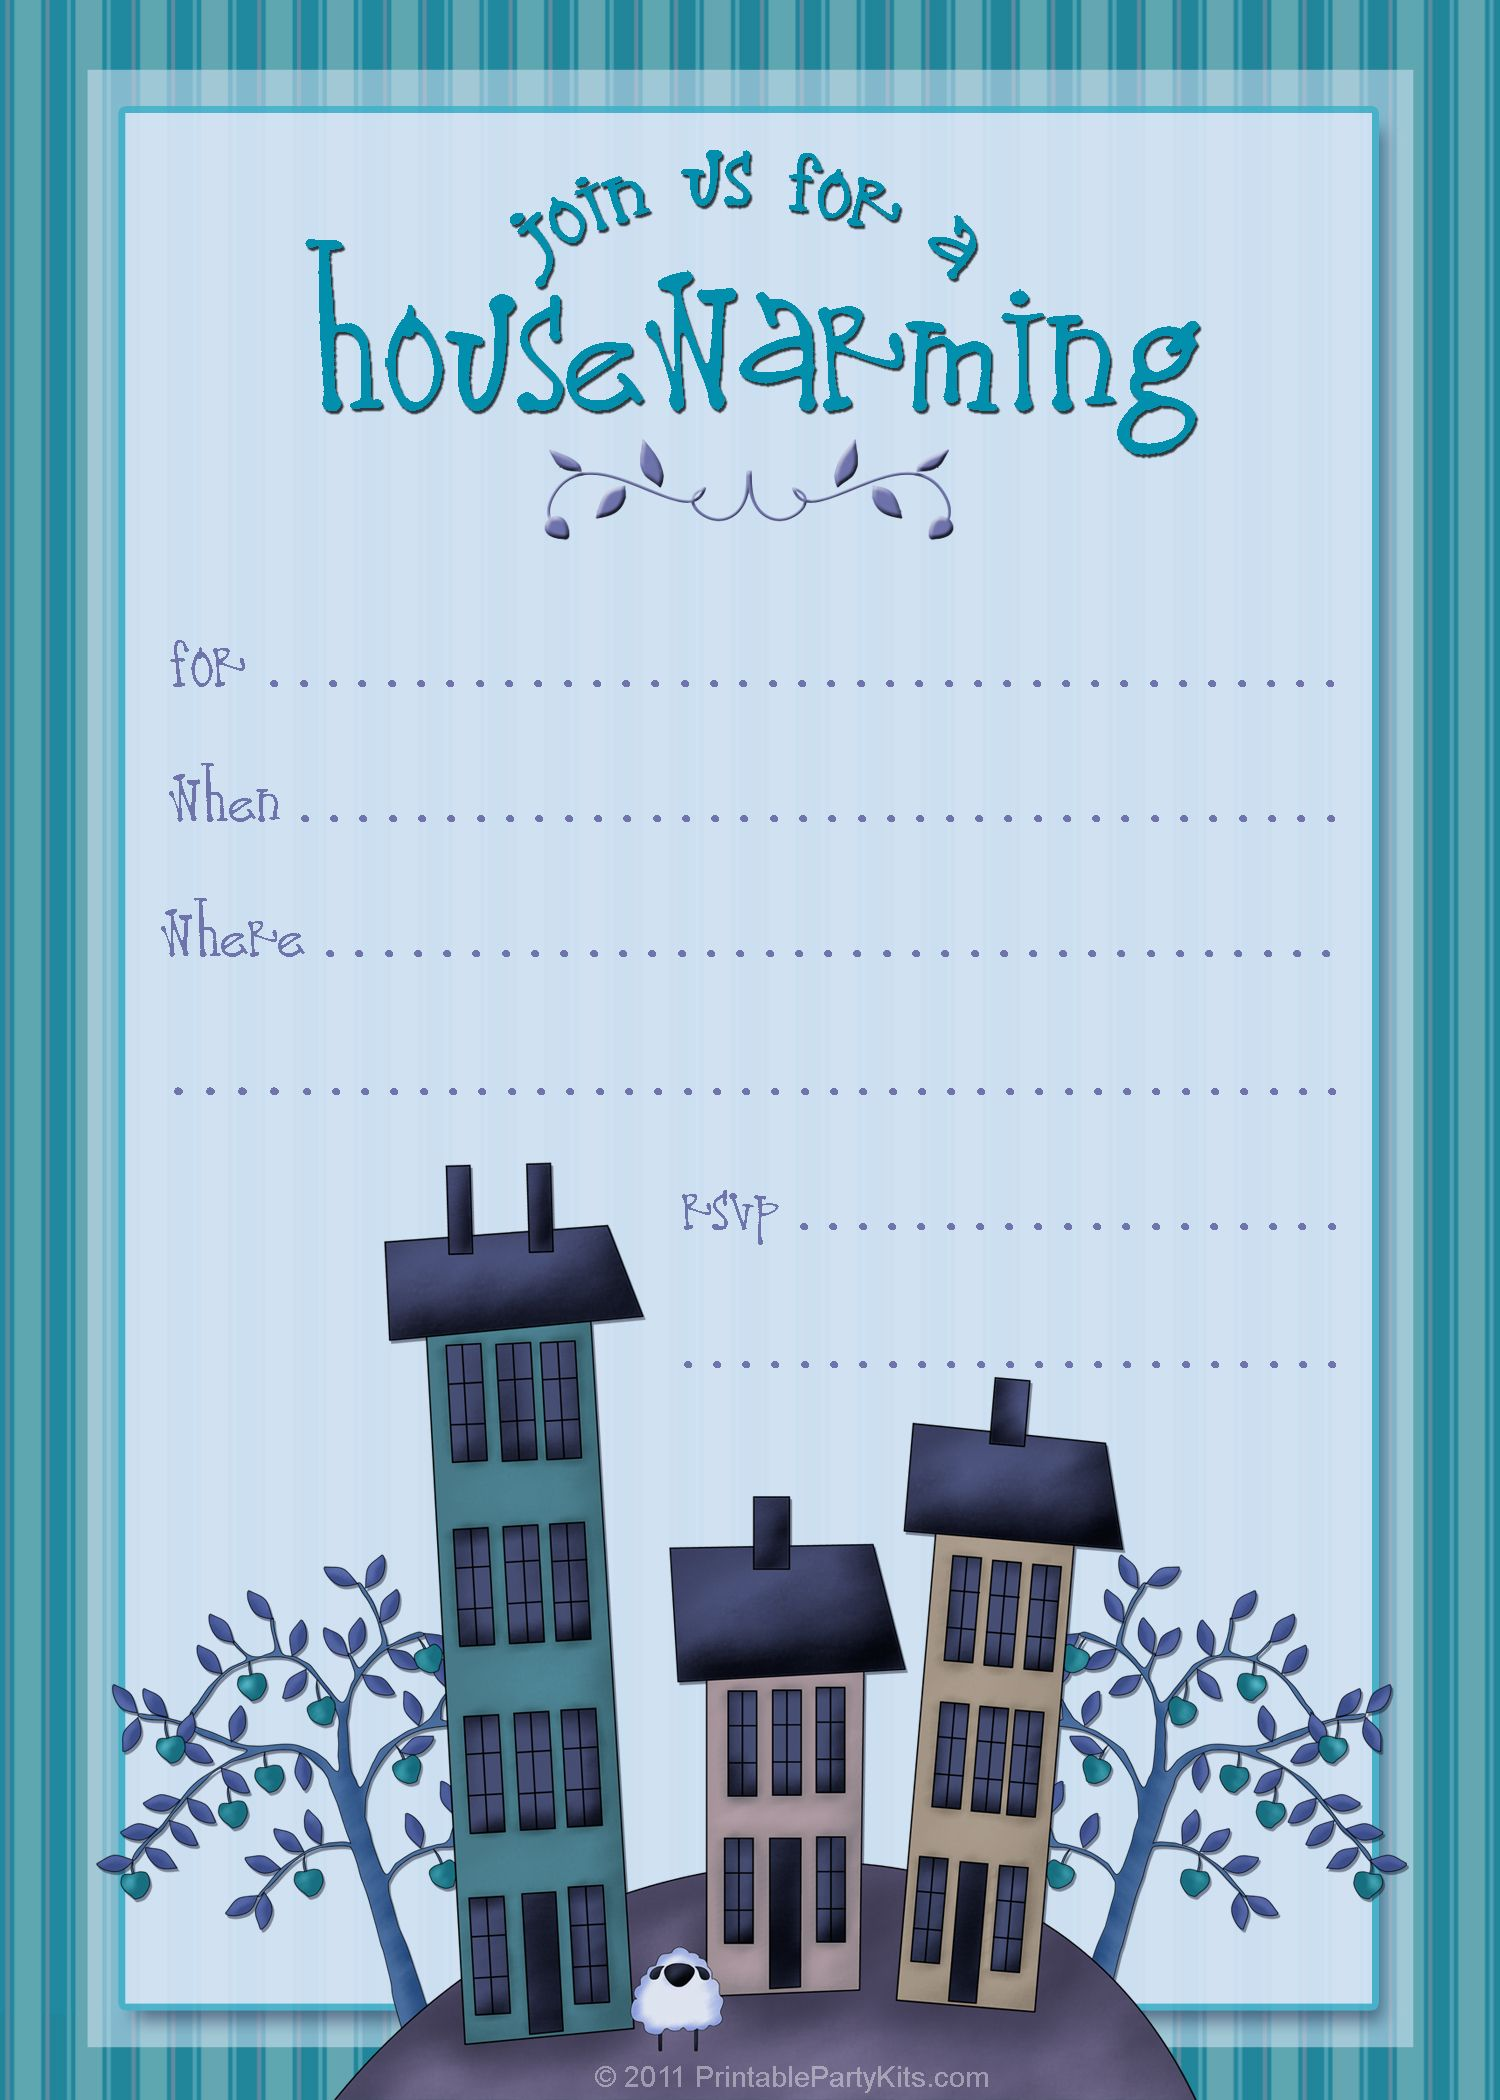 Housewarming invite template also ideas pinterest rh